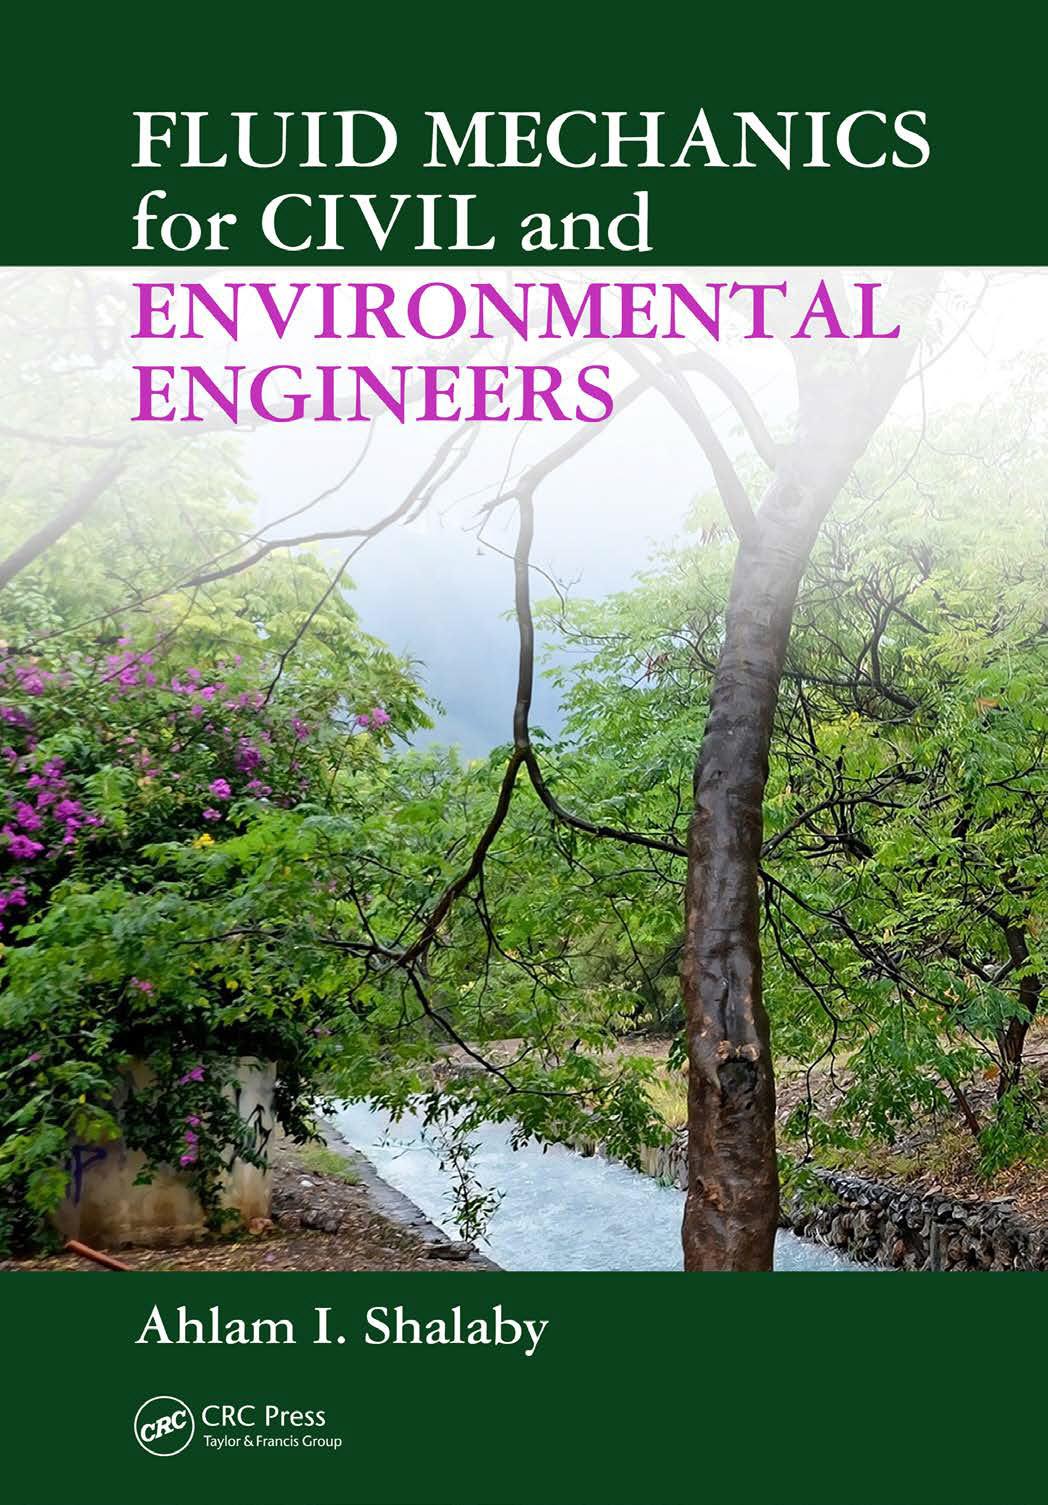 Fluid Mechanics for Civil and Environmental Engineers